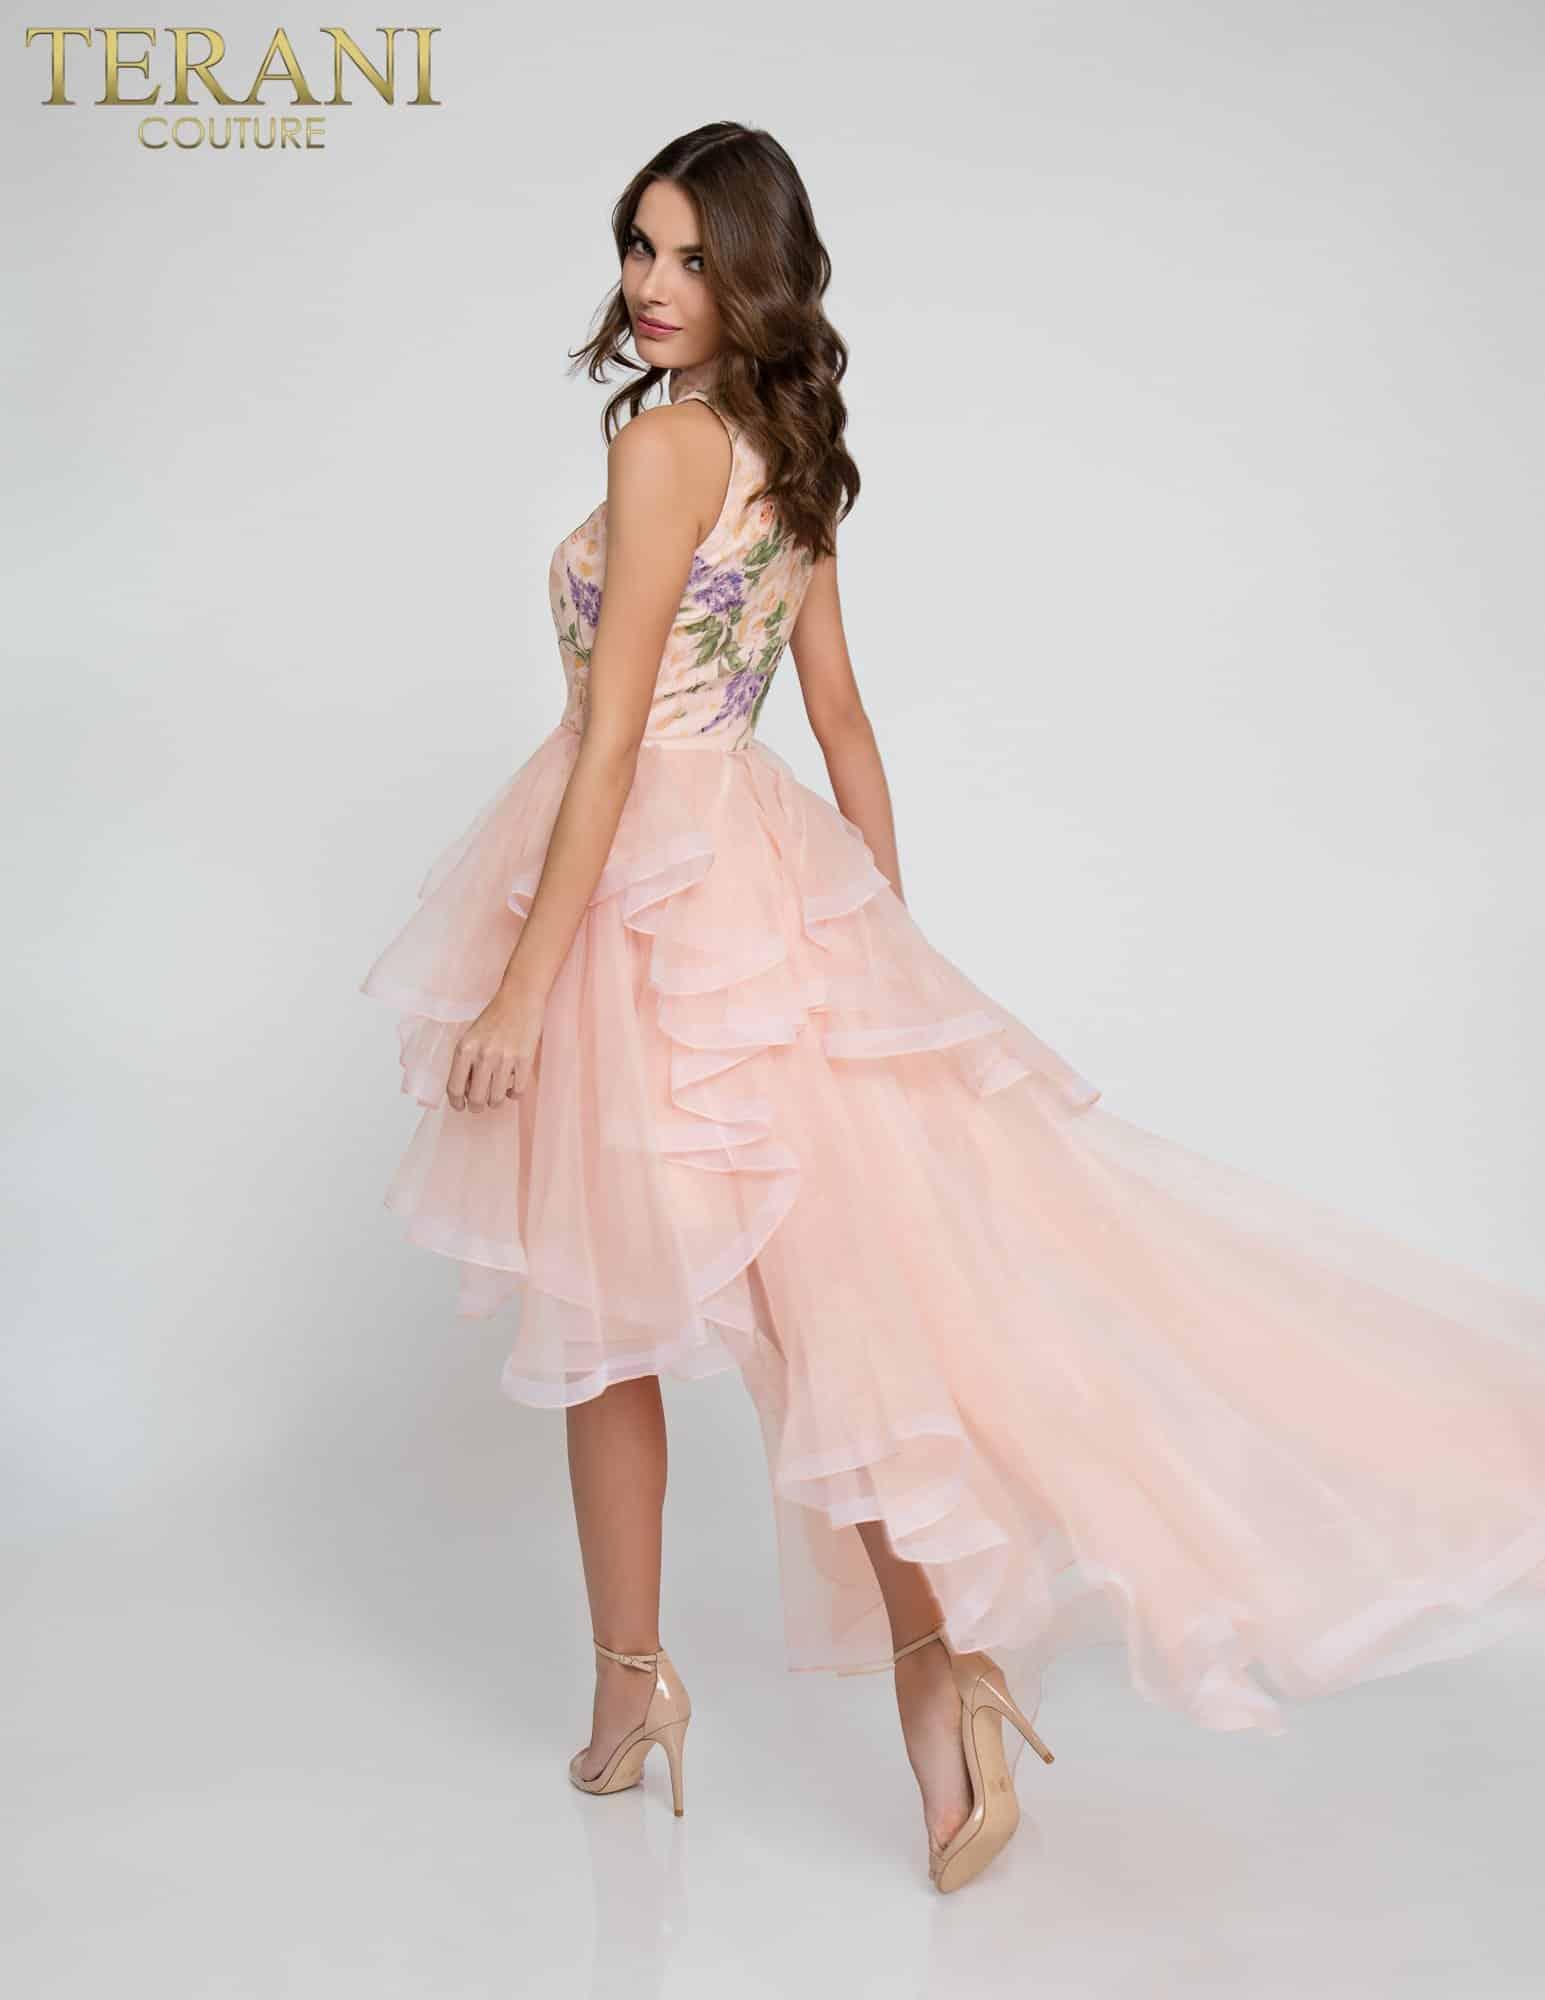 High Neck Floral Print Organza Prom Dress - 1811P5810